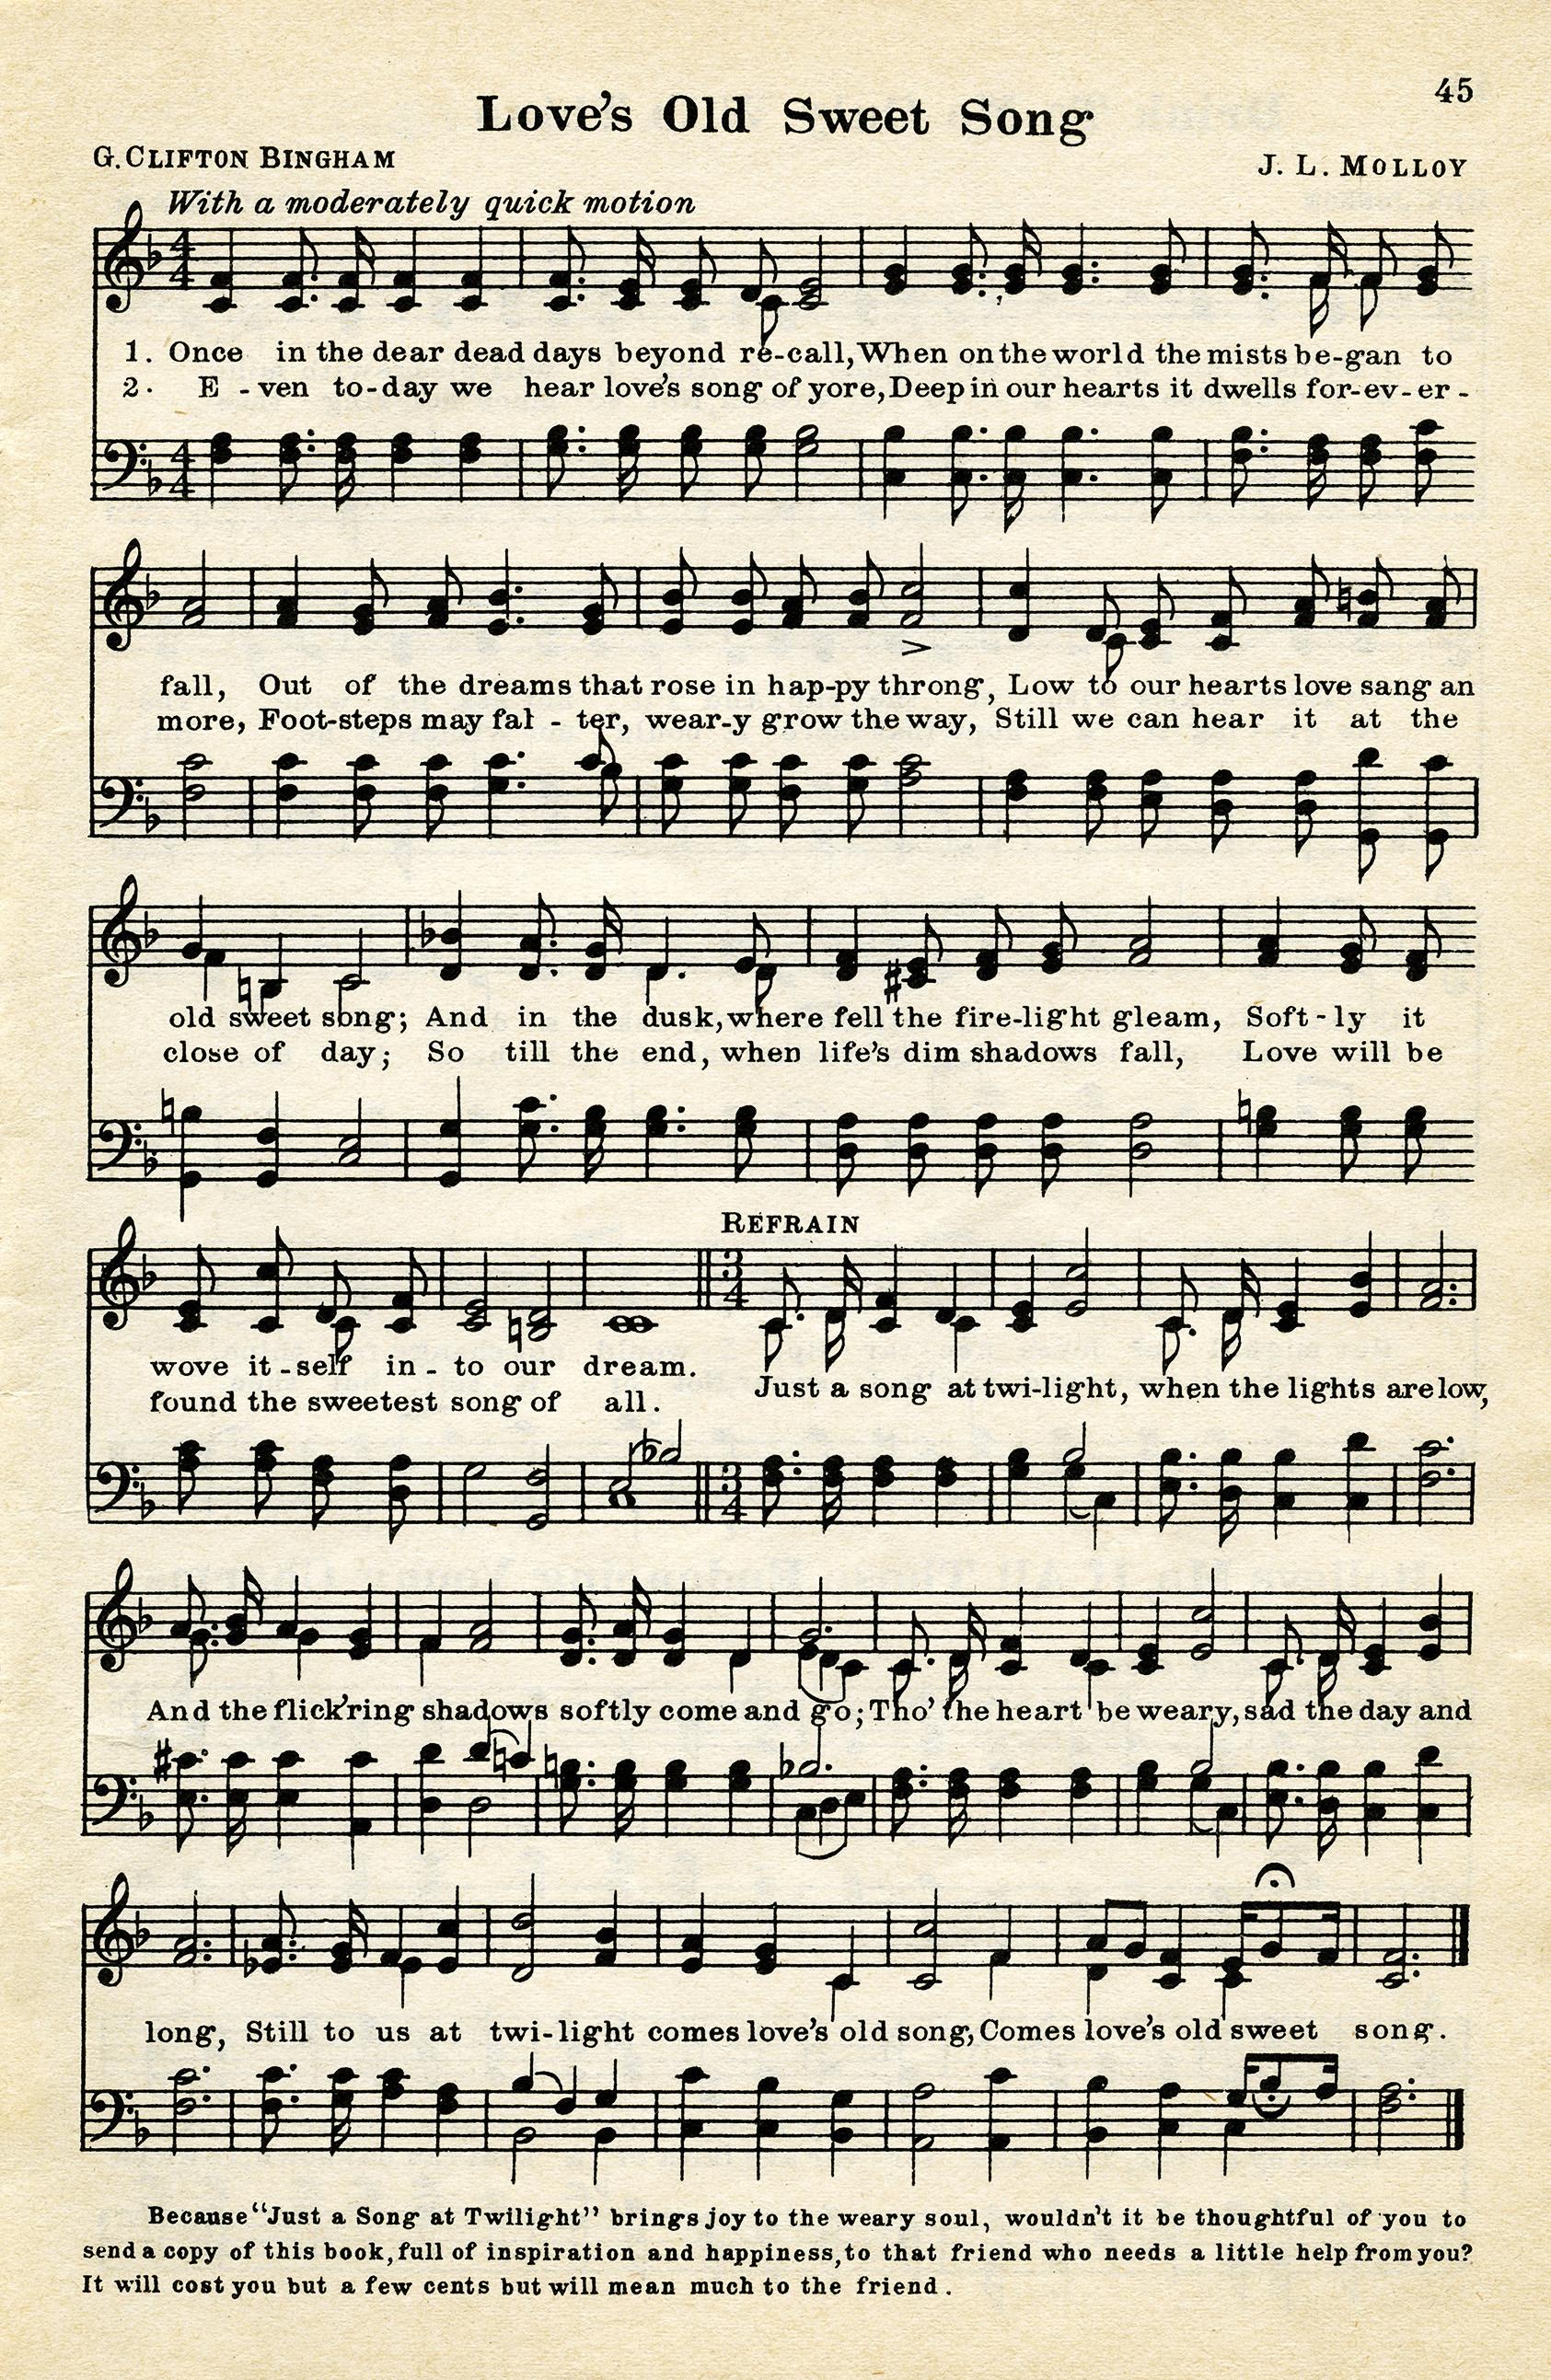 Free Vintage Printable Love Song Sheet Music - Old Design Shop Blog - Christmas Carols Sheet Music Free Printable